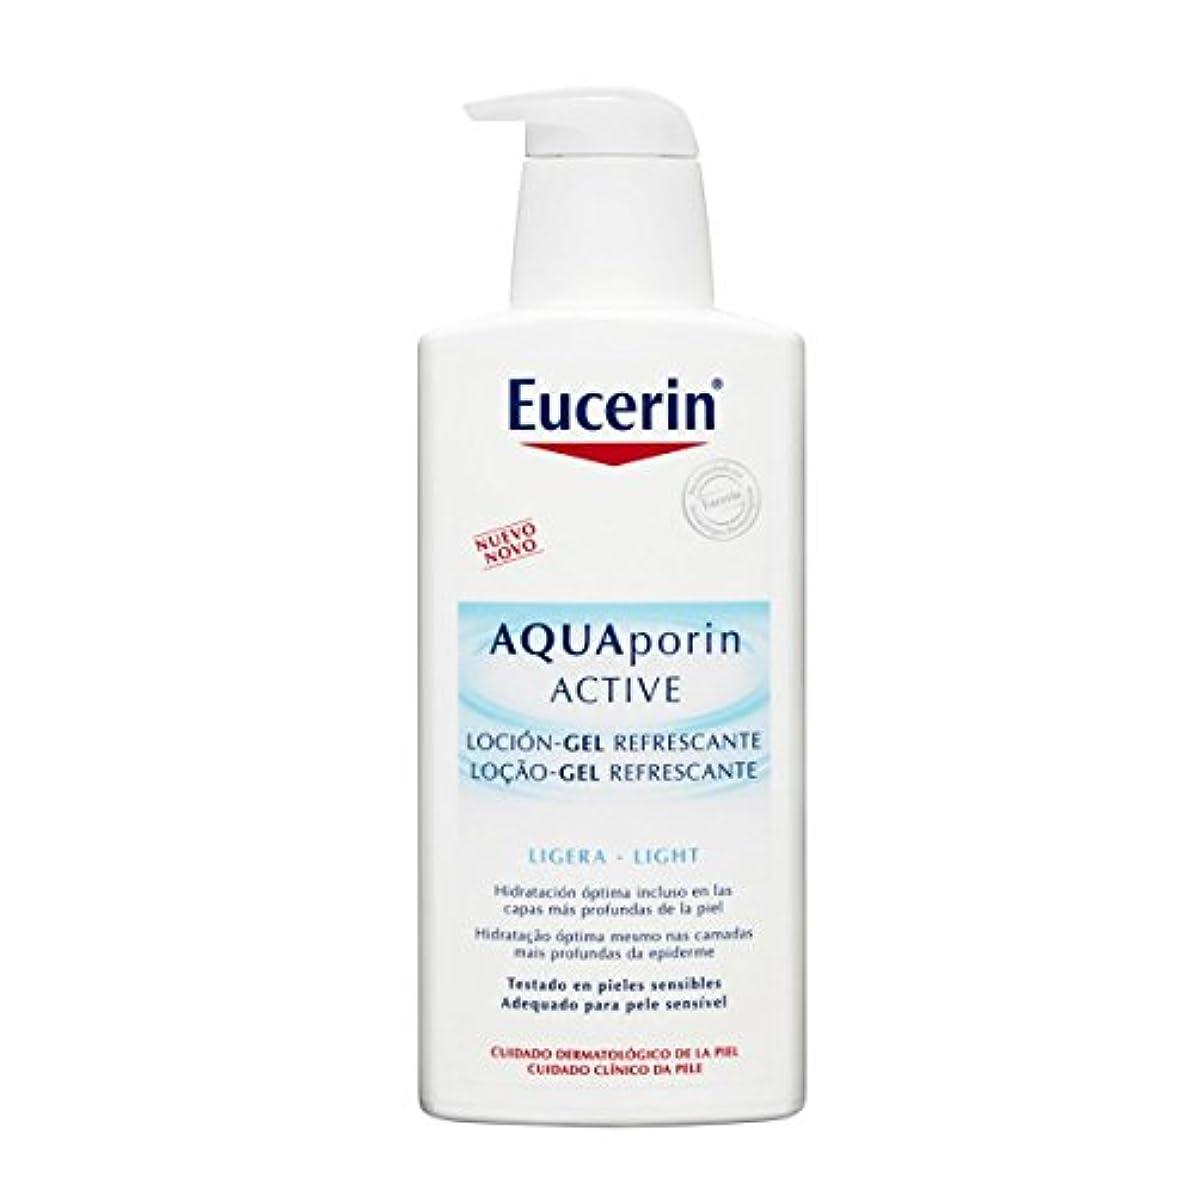 規範信仰降雨Eucerin Aquaporin Active Intense Body Balm 400ml [並行輸入品]